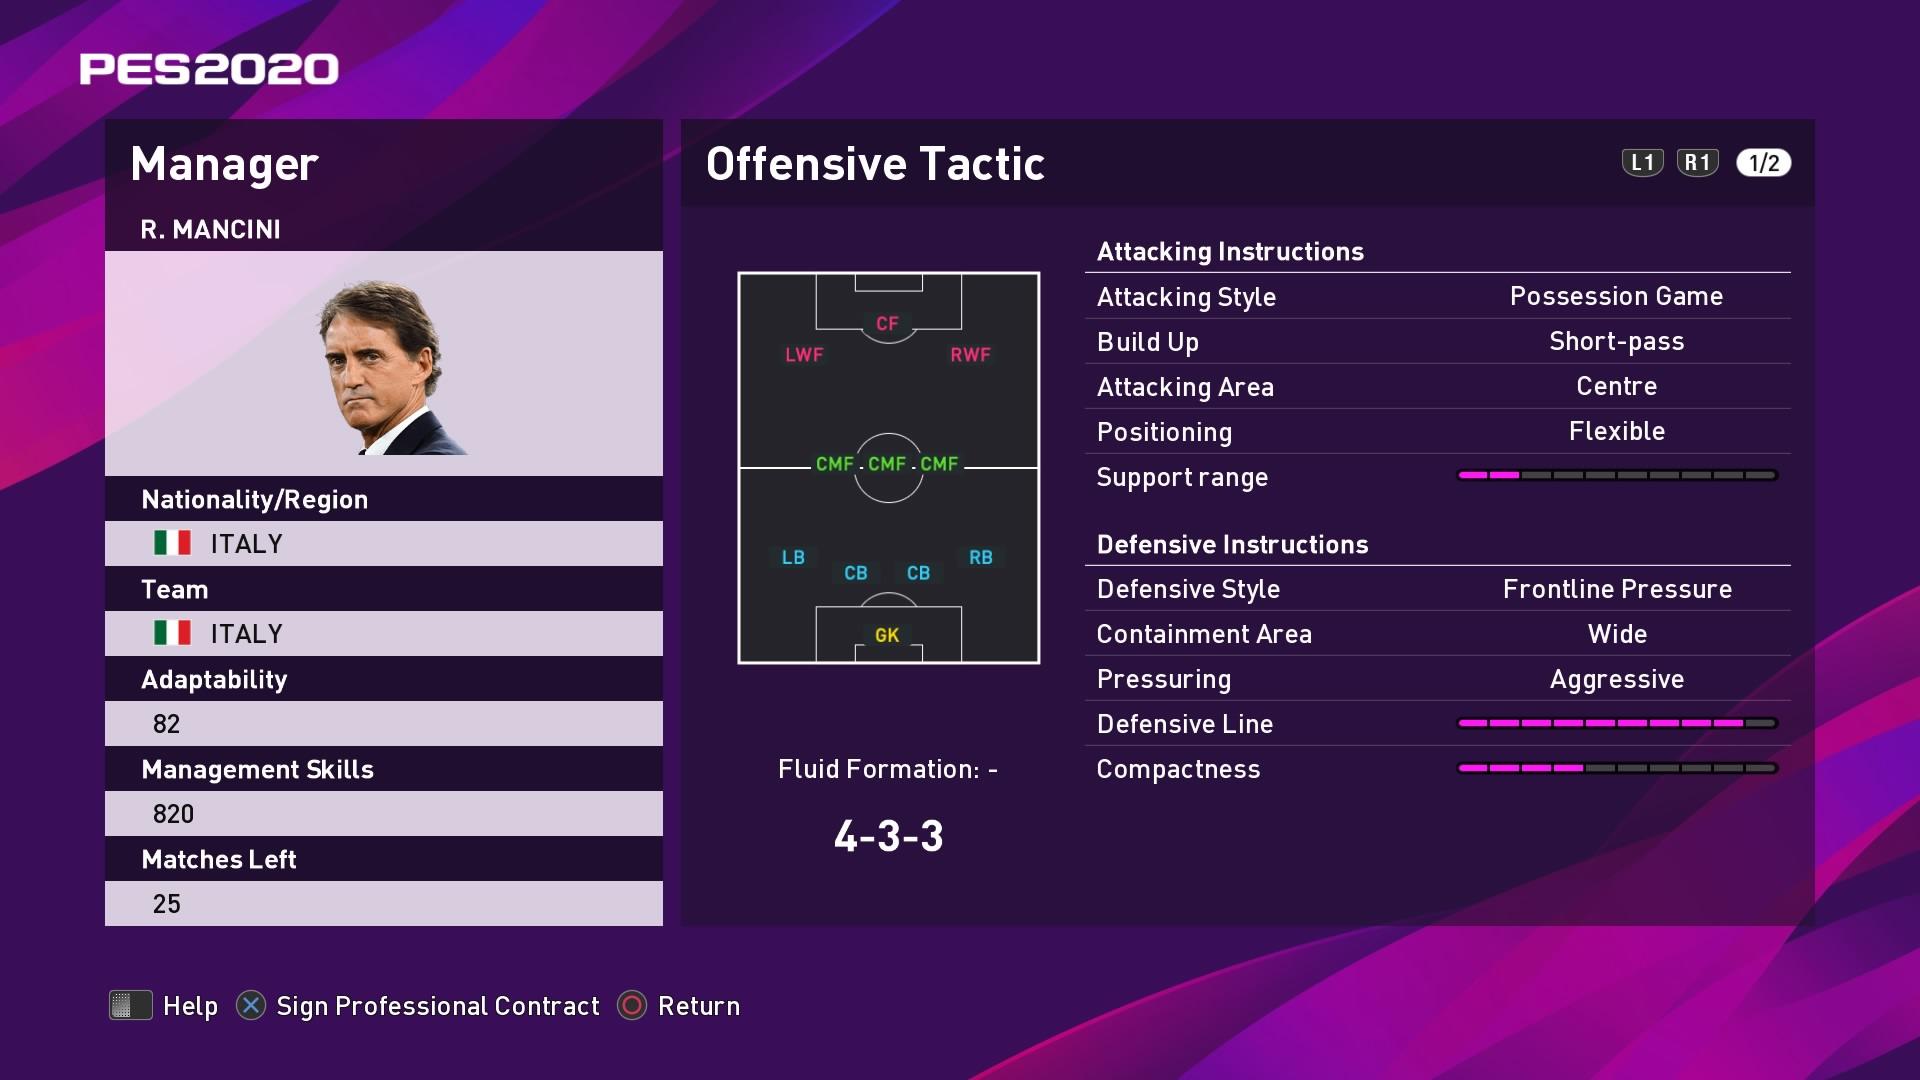 R. Mancini (2) (Roberto Macini) Offensive Tactic in PES 2020 myClub